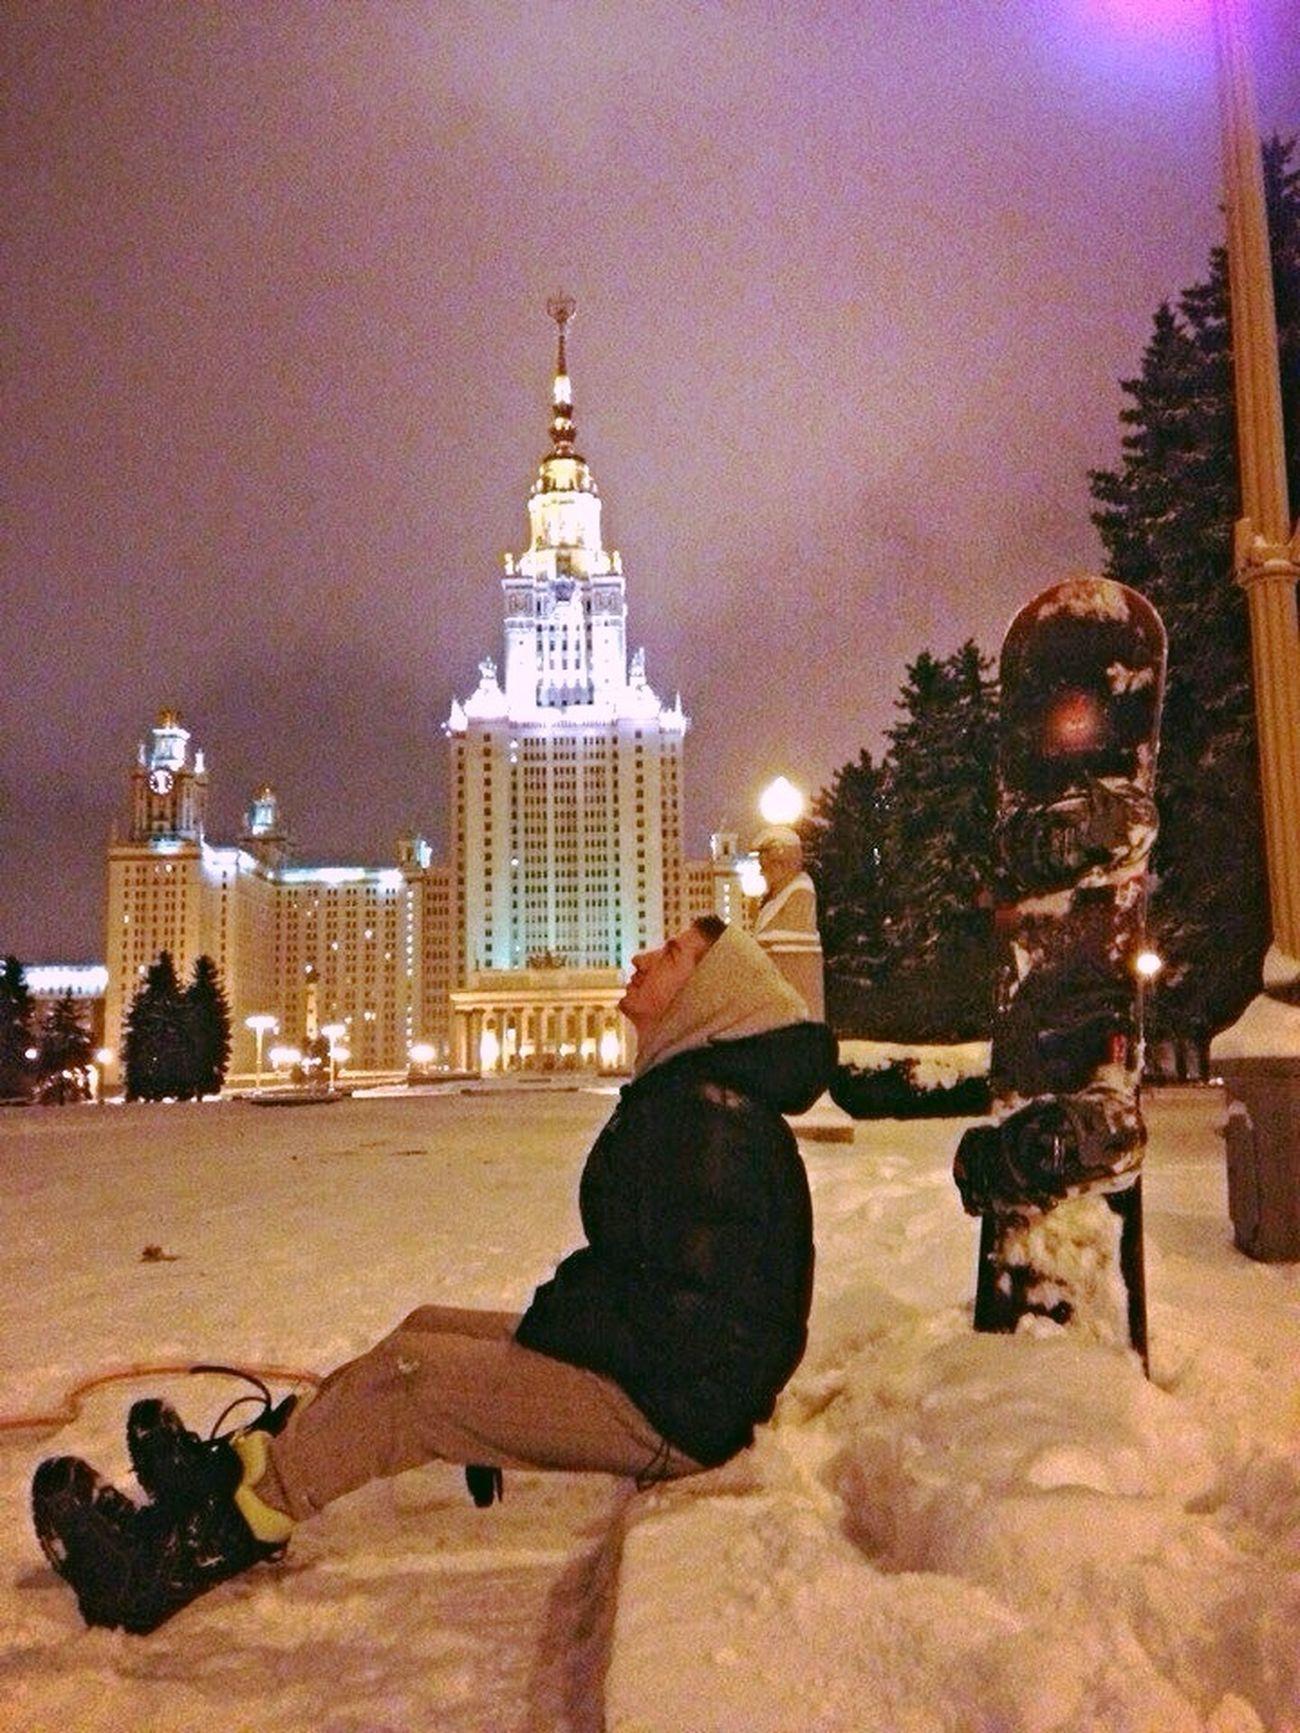 МГУ Smotra большой газон МГУ Snowboarding